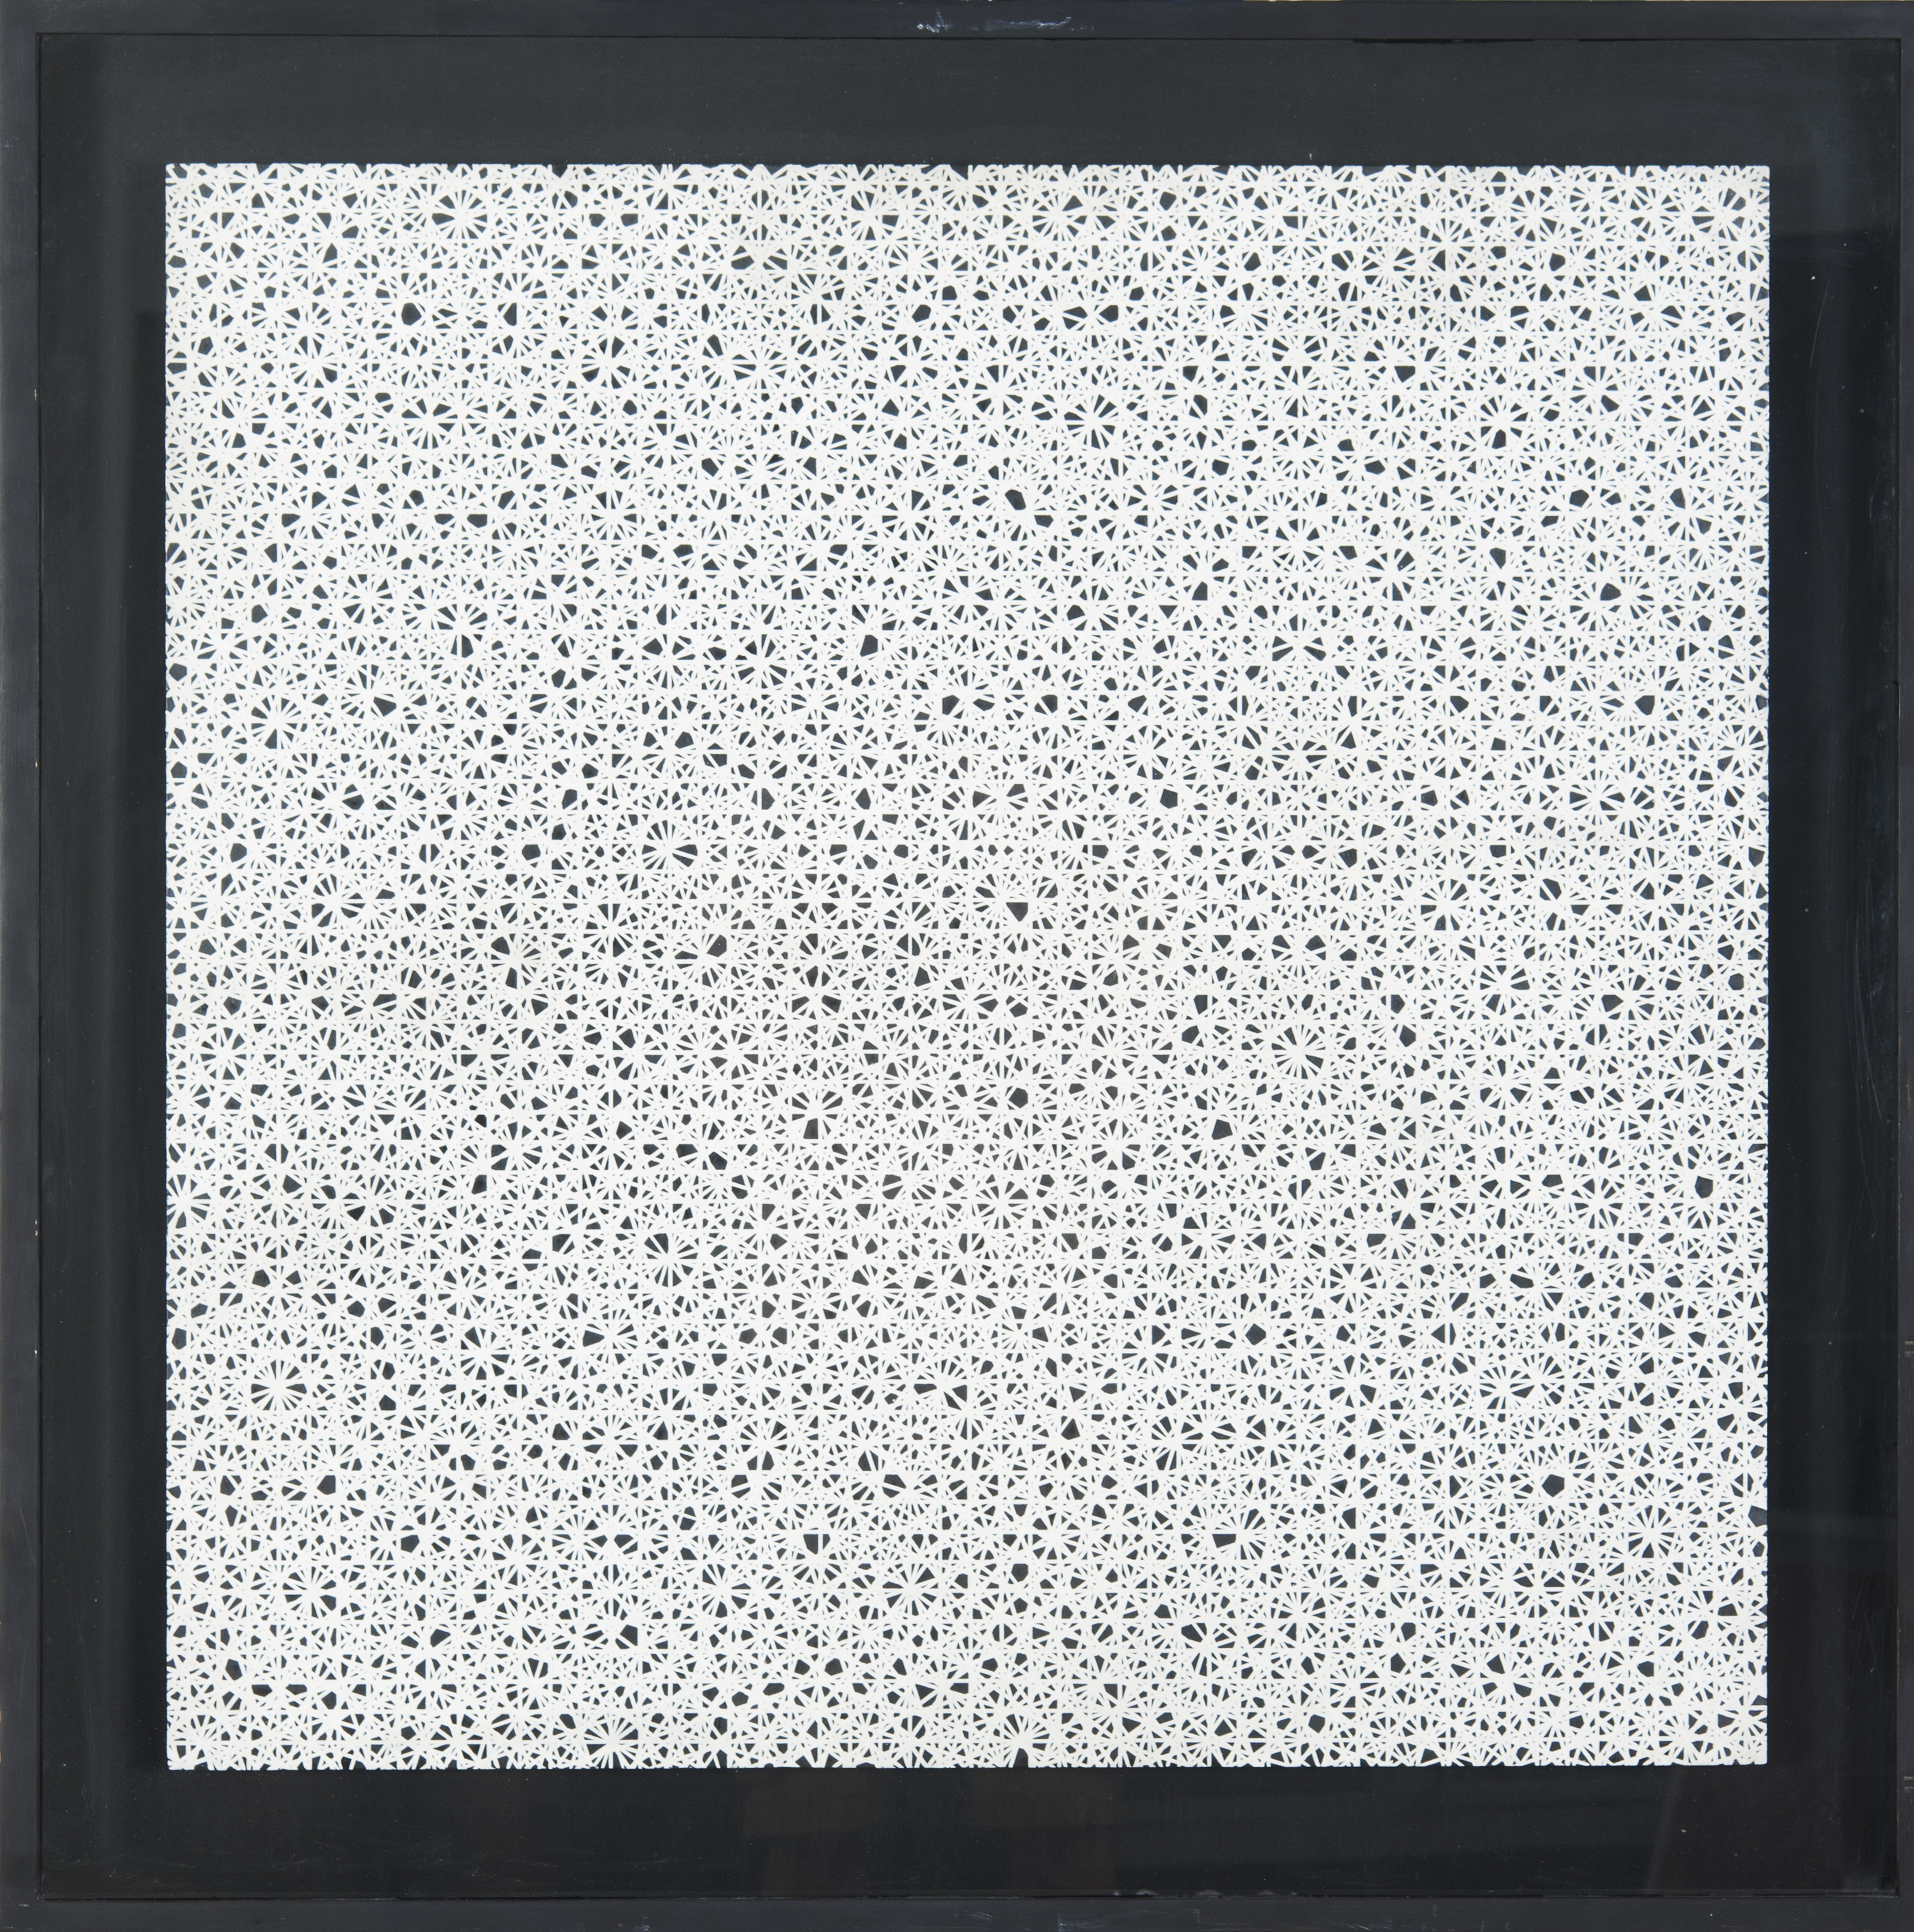 artart-collection-035